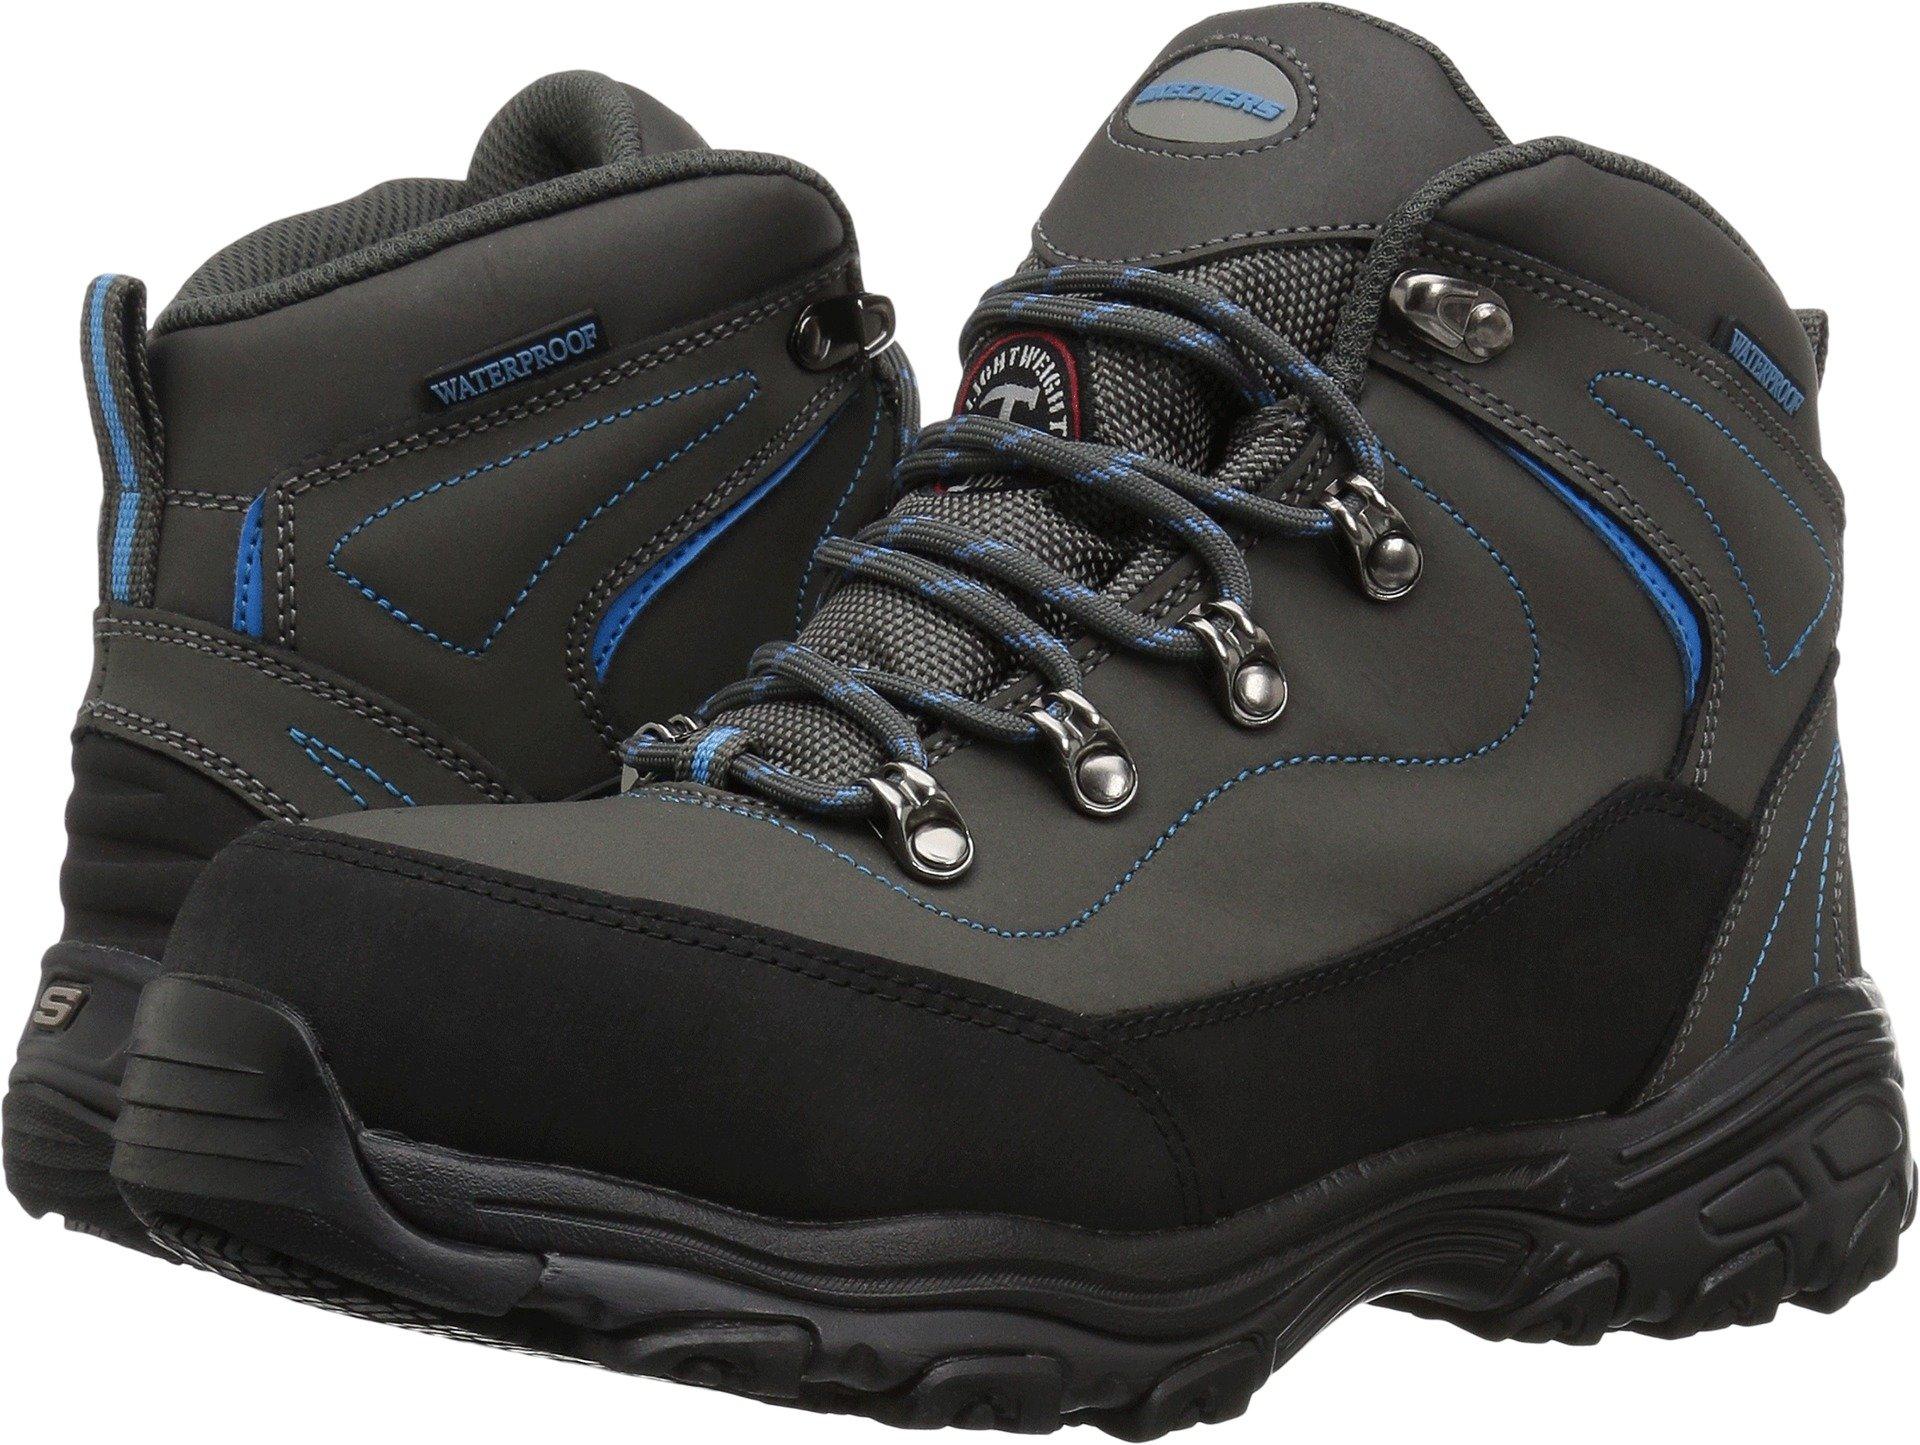 Skechers for Work Women's D Lite Amasa Work Boot, Gray Blue, 8.5 W US